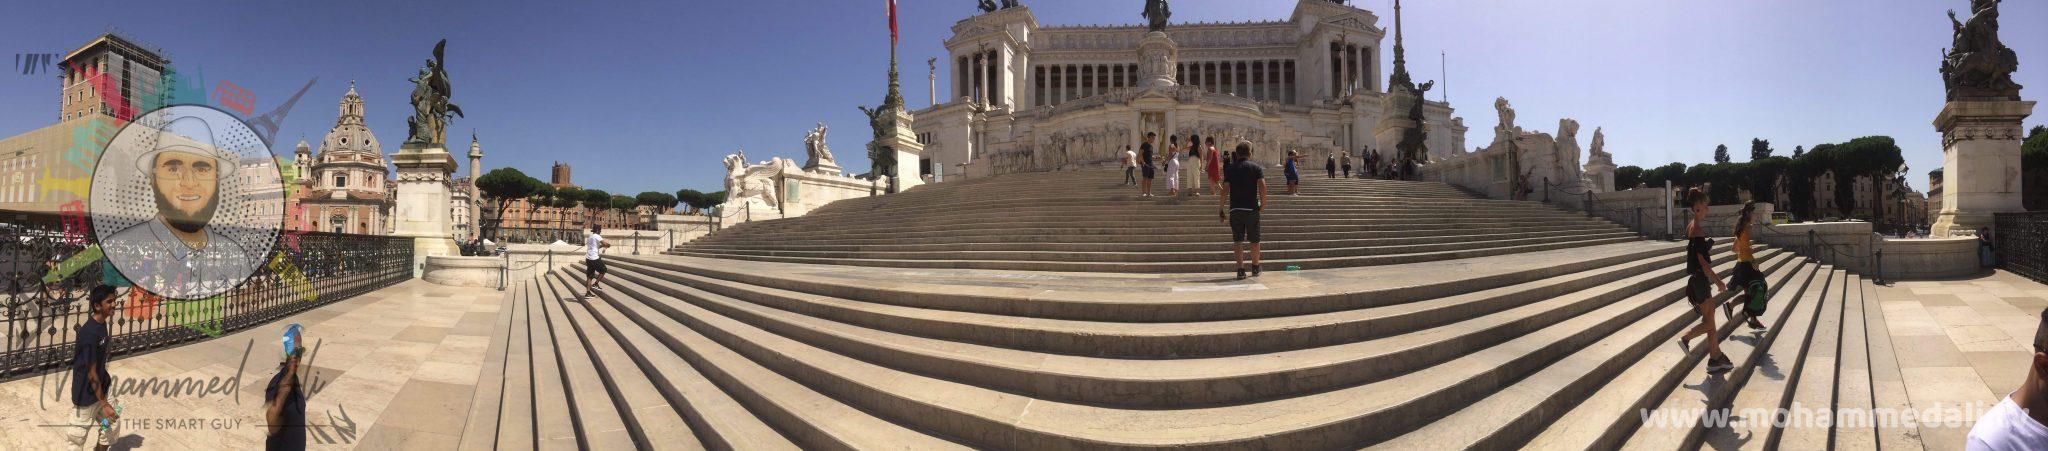 Amazing view onto the Vittorio Emanuele II Monument in Rome